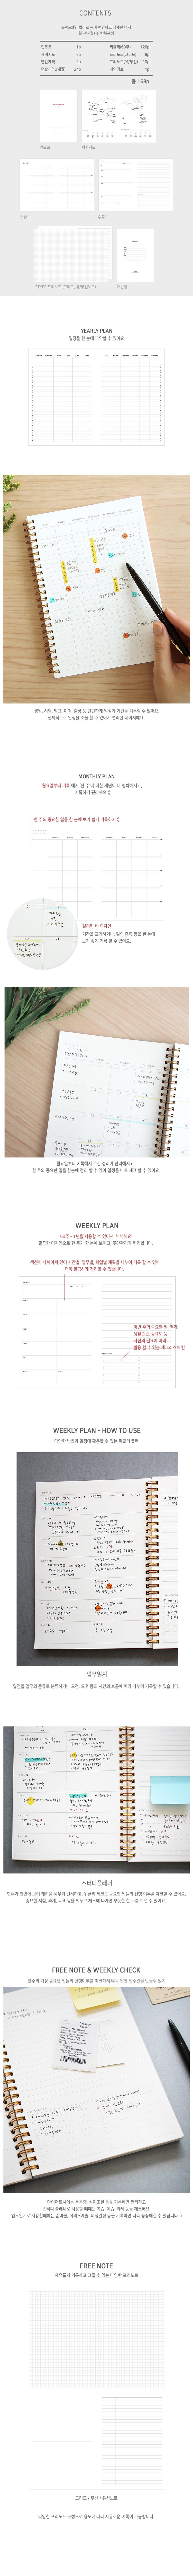 Weekly Schedule (basic) - 대시앤도트, 12,000원, 스케줄러, 위클리스케줄러